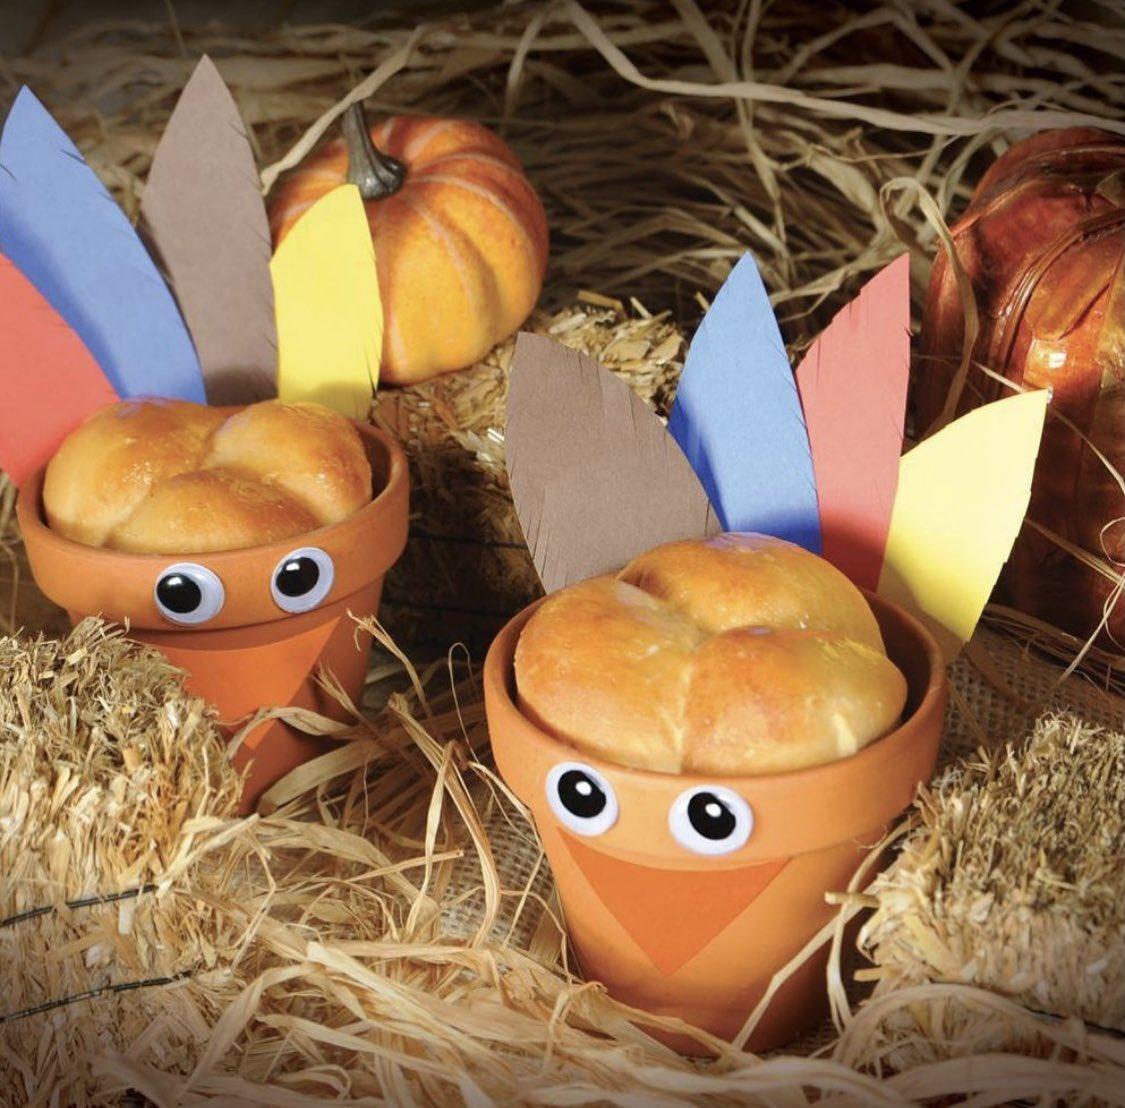 Happy Thanksgiving from all of us at Bridgford Foods! #gobblegobble #turkeyday #passtherolls #bridgfordfoods